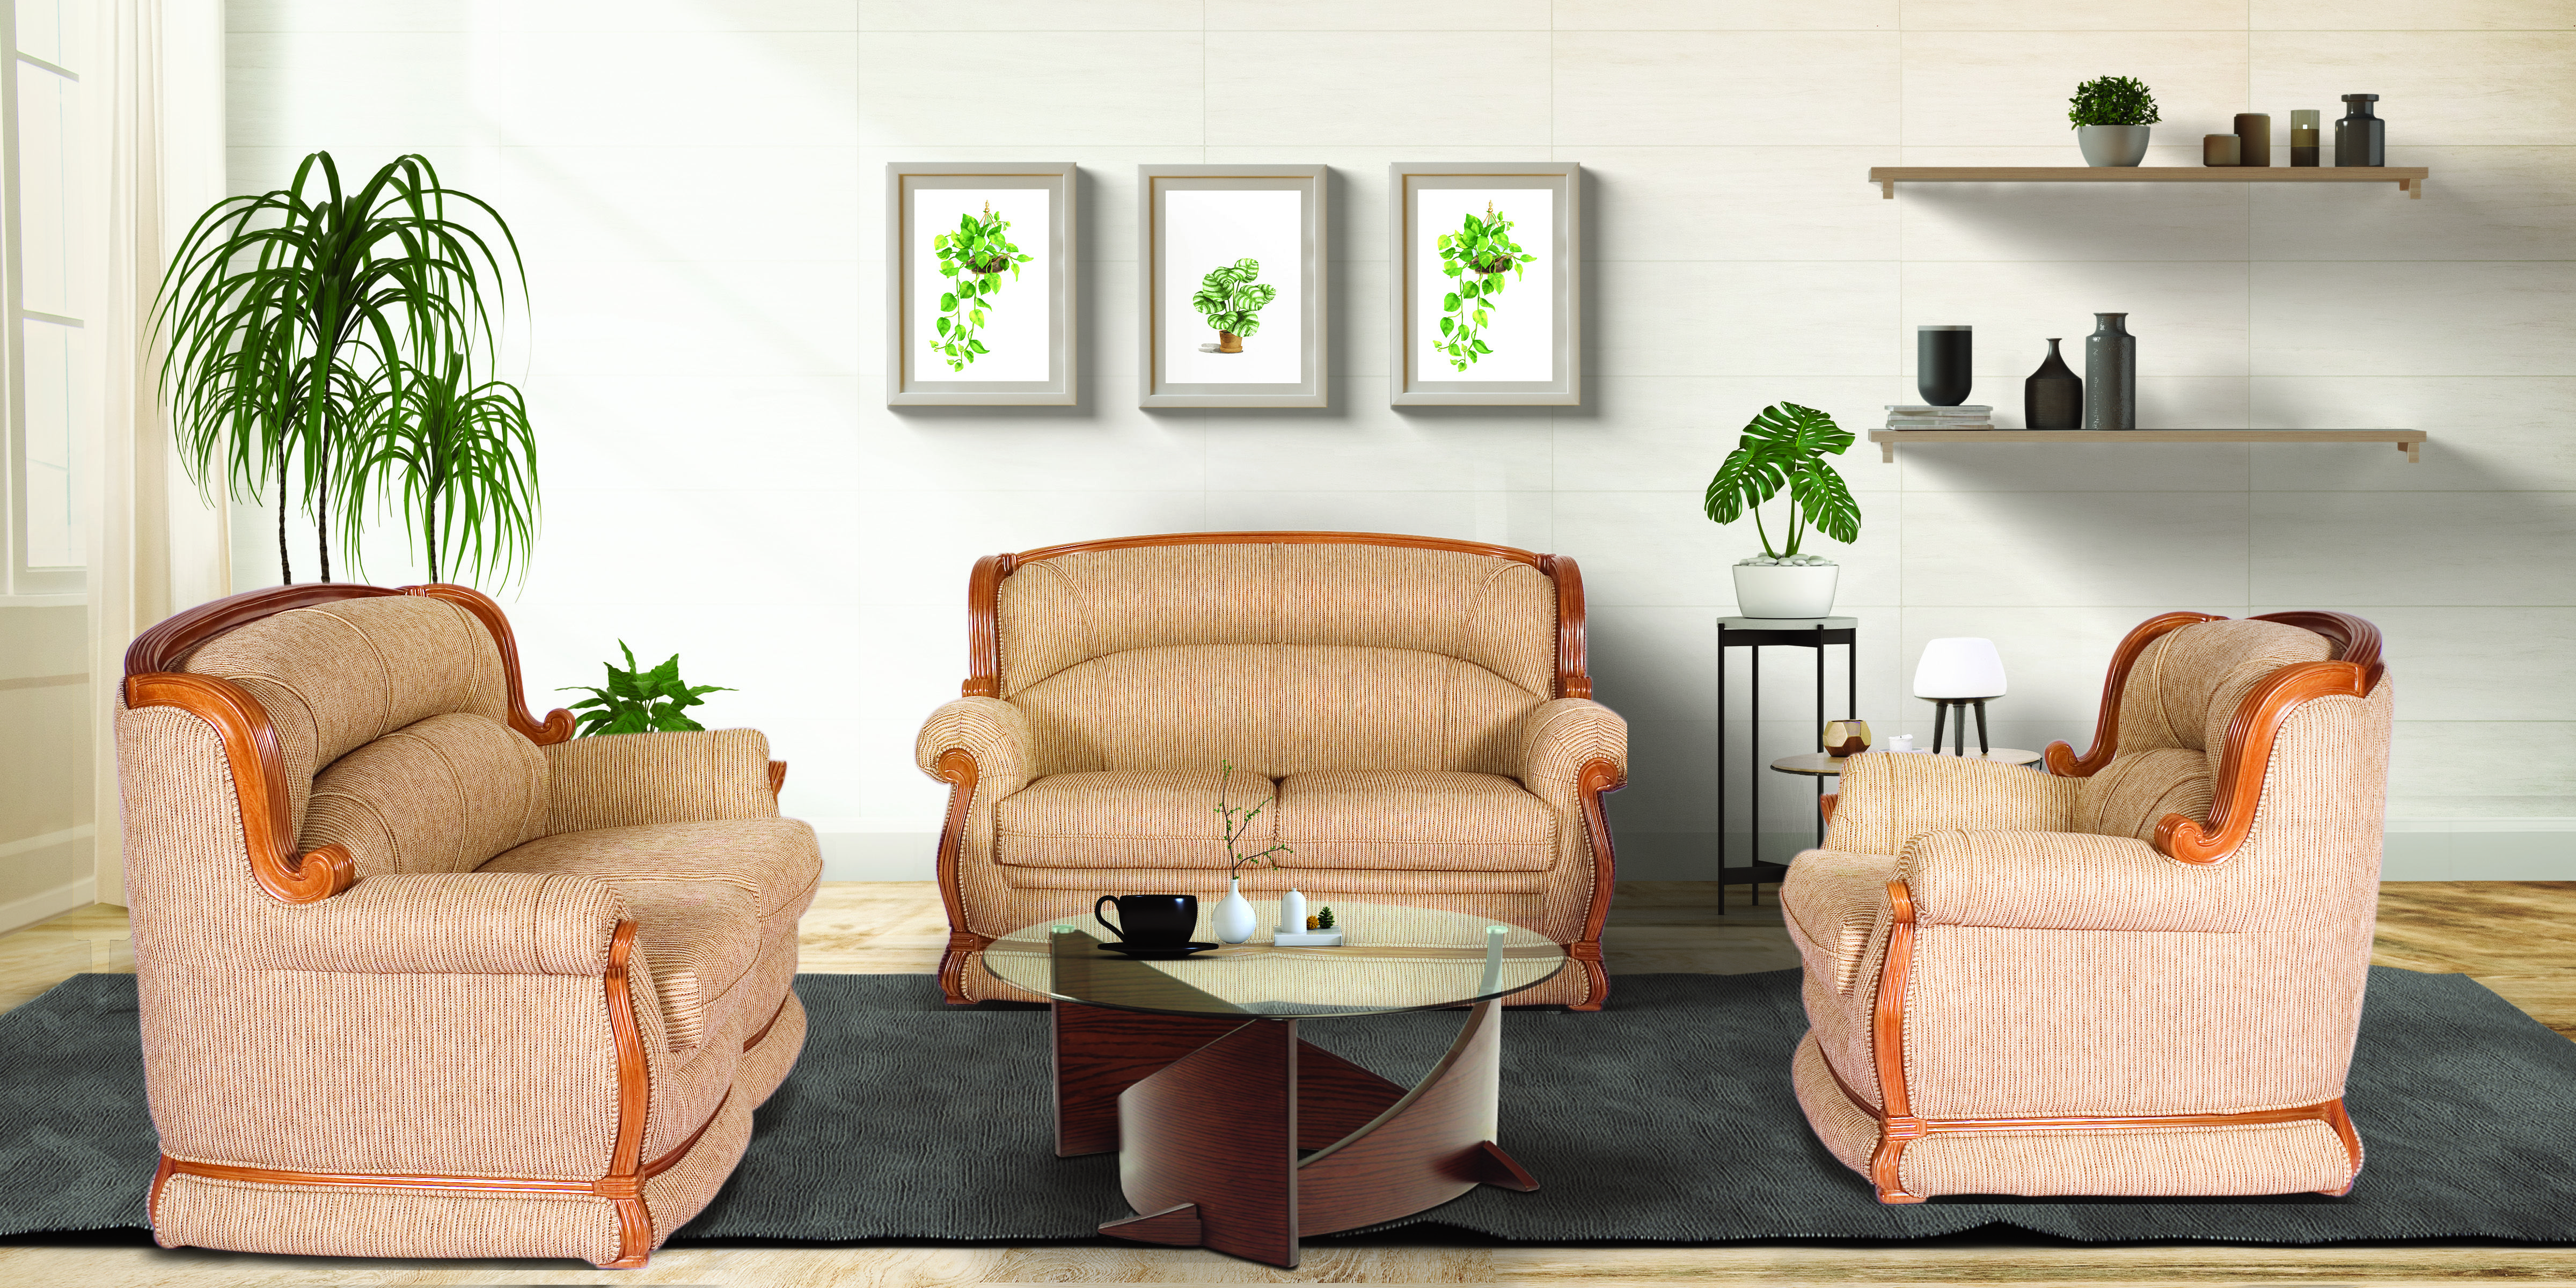 2 Seater Sofa Price In 2020 2 Seater Sofa Sofa Price Sofa